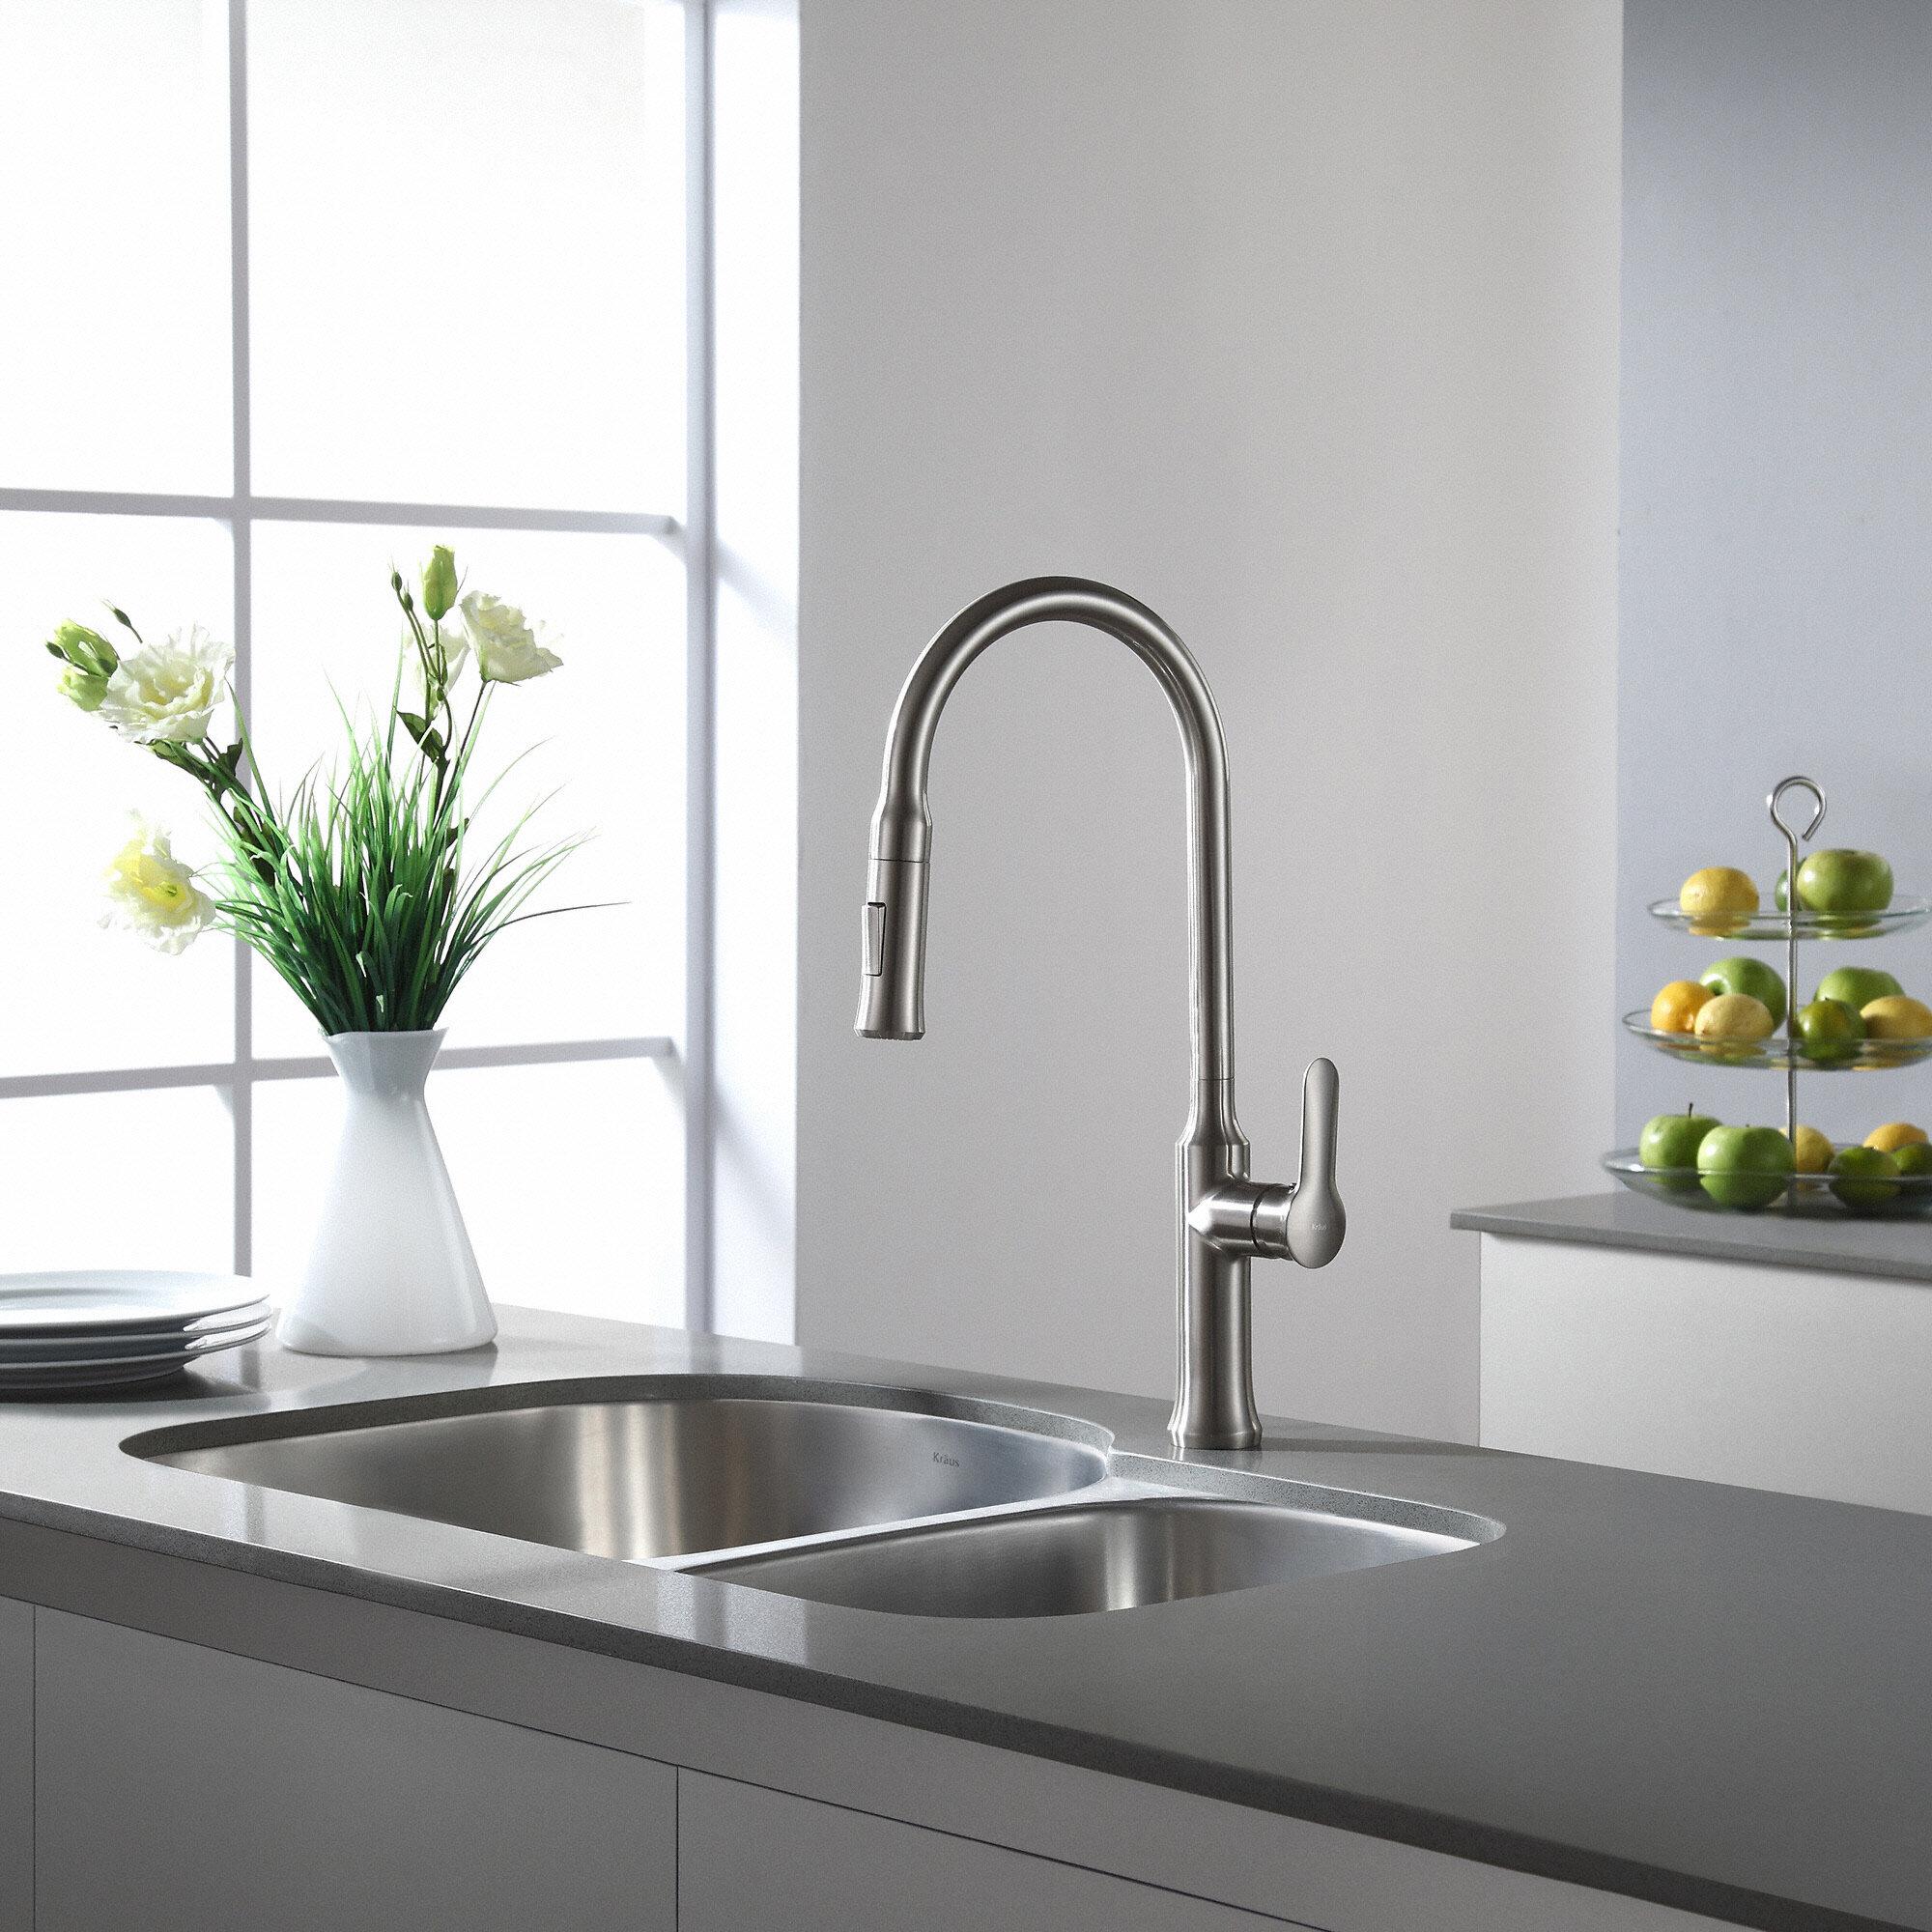 Incroyable KPF 1630SS,CH Kraus Nola Pull Down Single Handle Kitchen Faucet U0026 Reviews    Wayfair